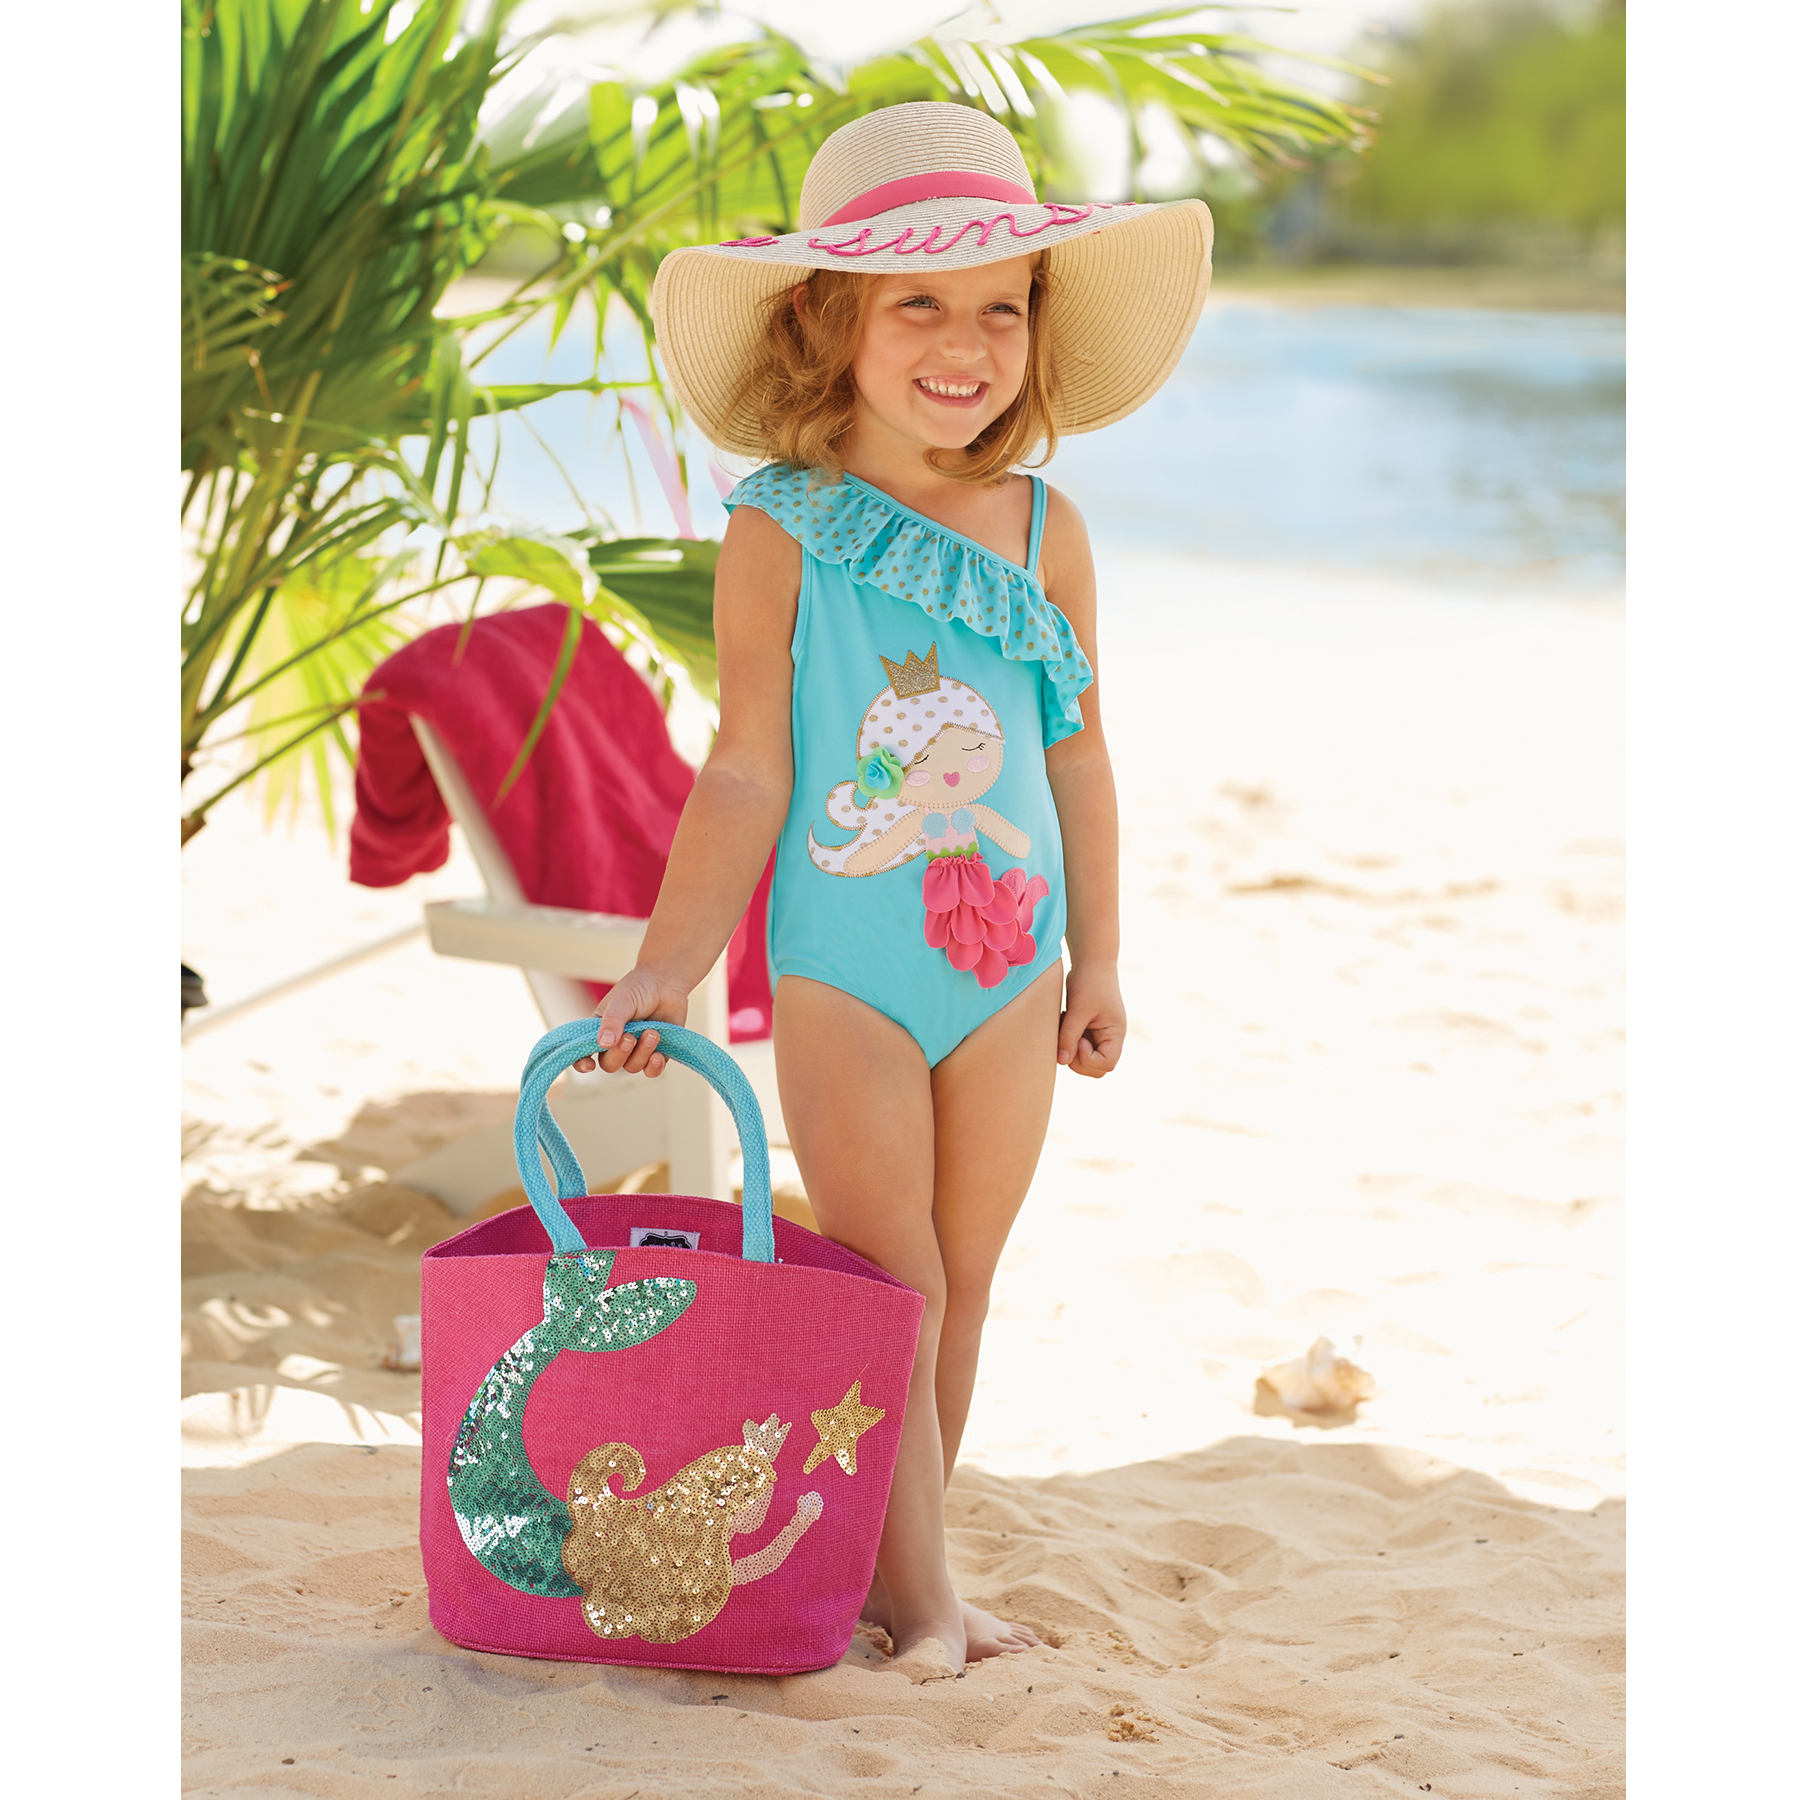 d1f9d2b0d1 Mud Pie E7 Baby Toddler Girl Blue Mermaid One Piece Swim Suit ...